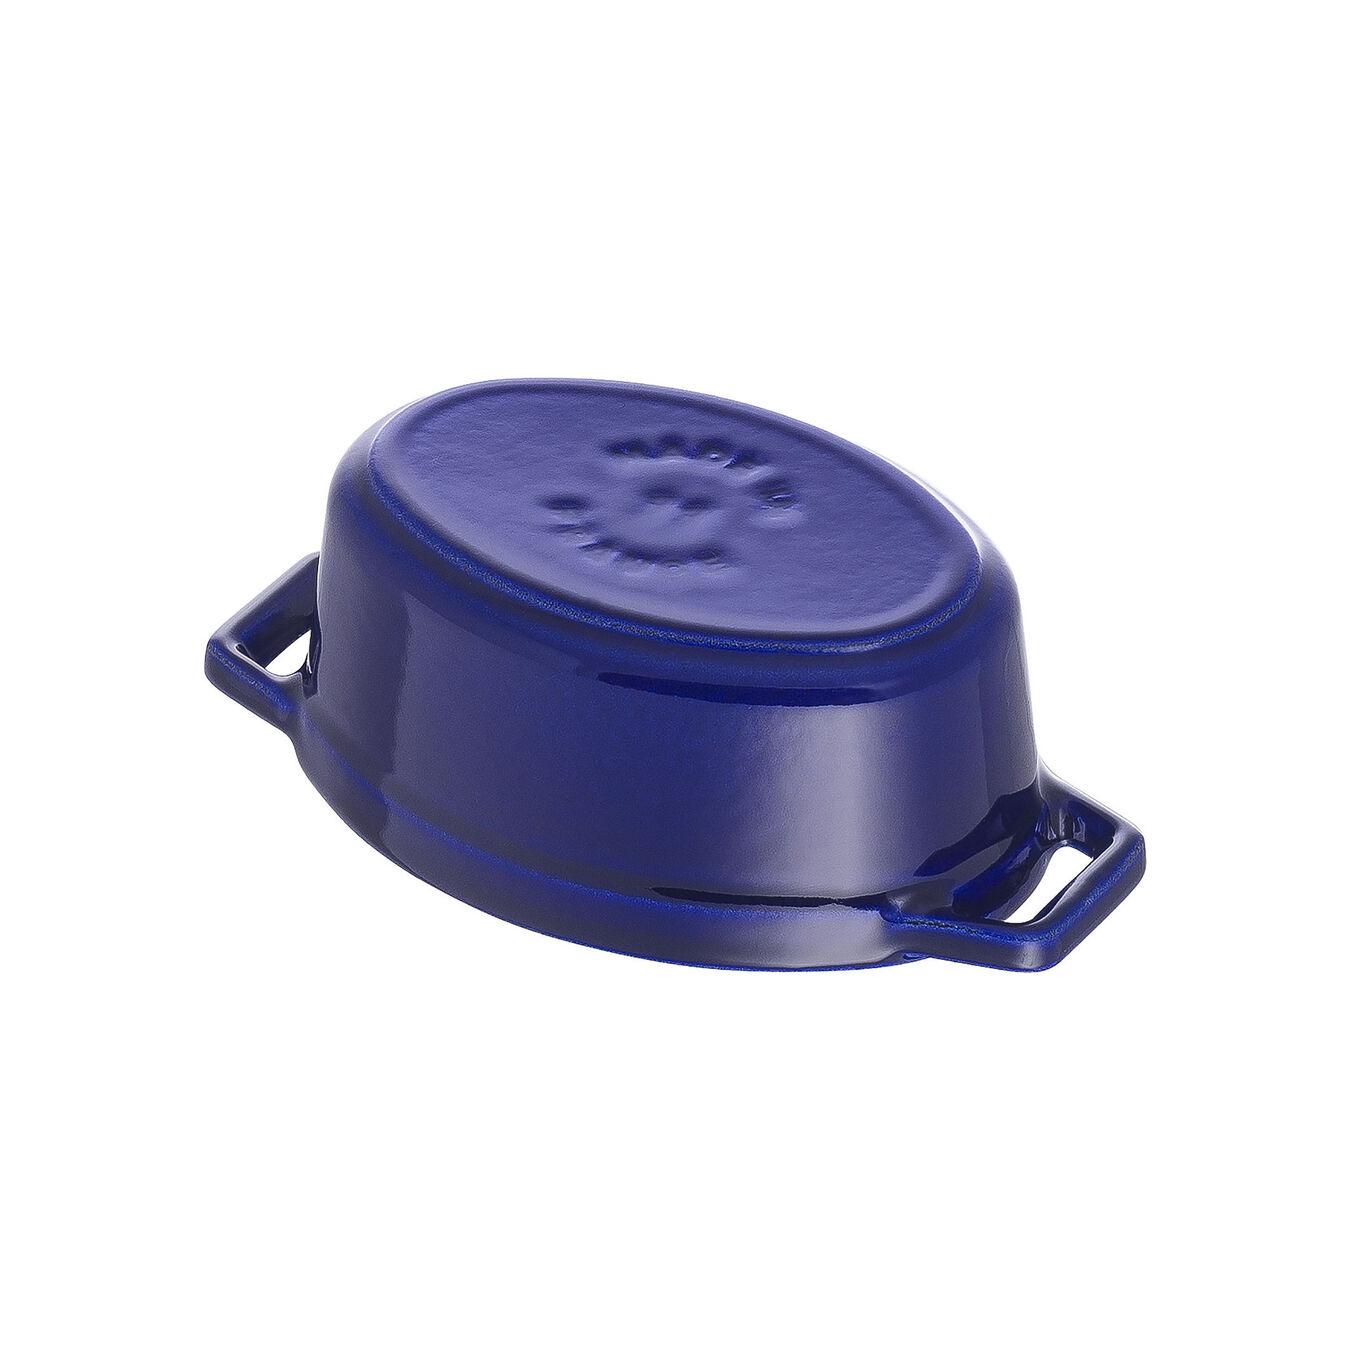 250 ml Cast iron oval Mini Cocotte, Dark-Blue,,large 4